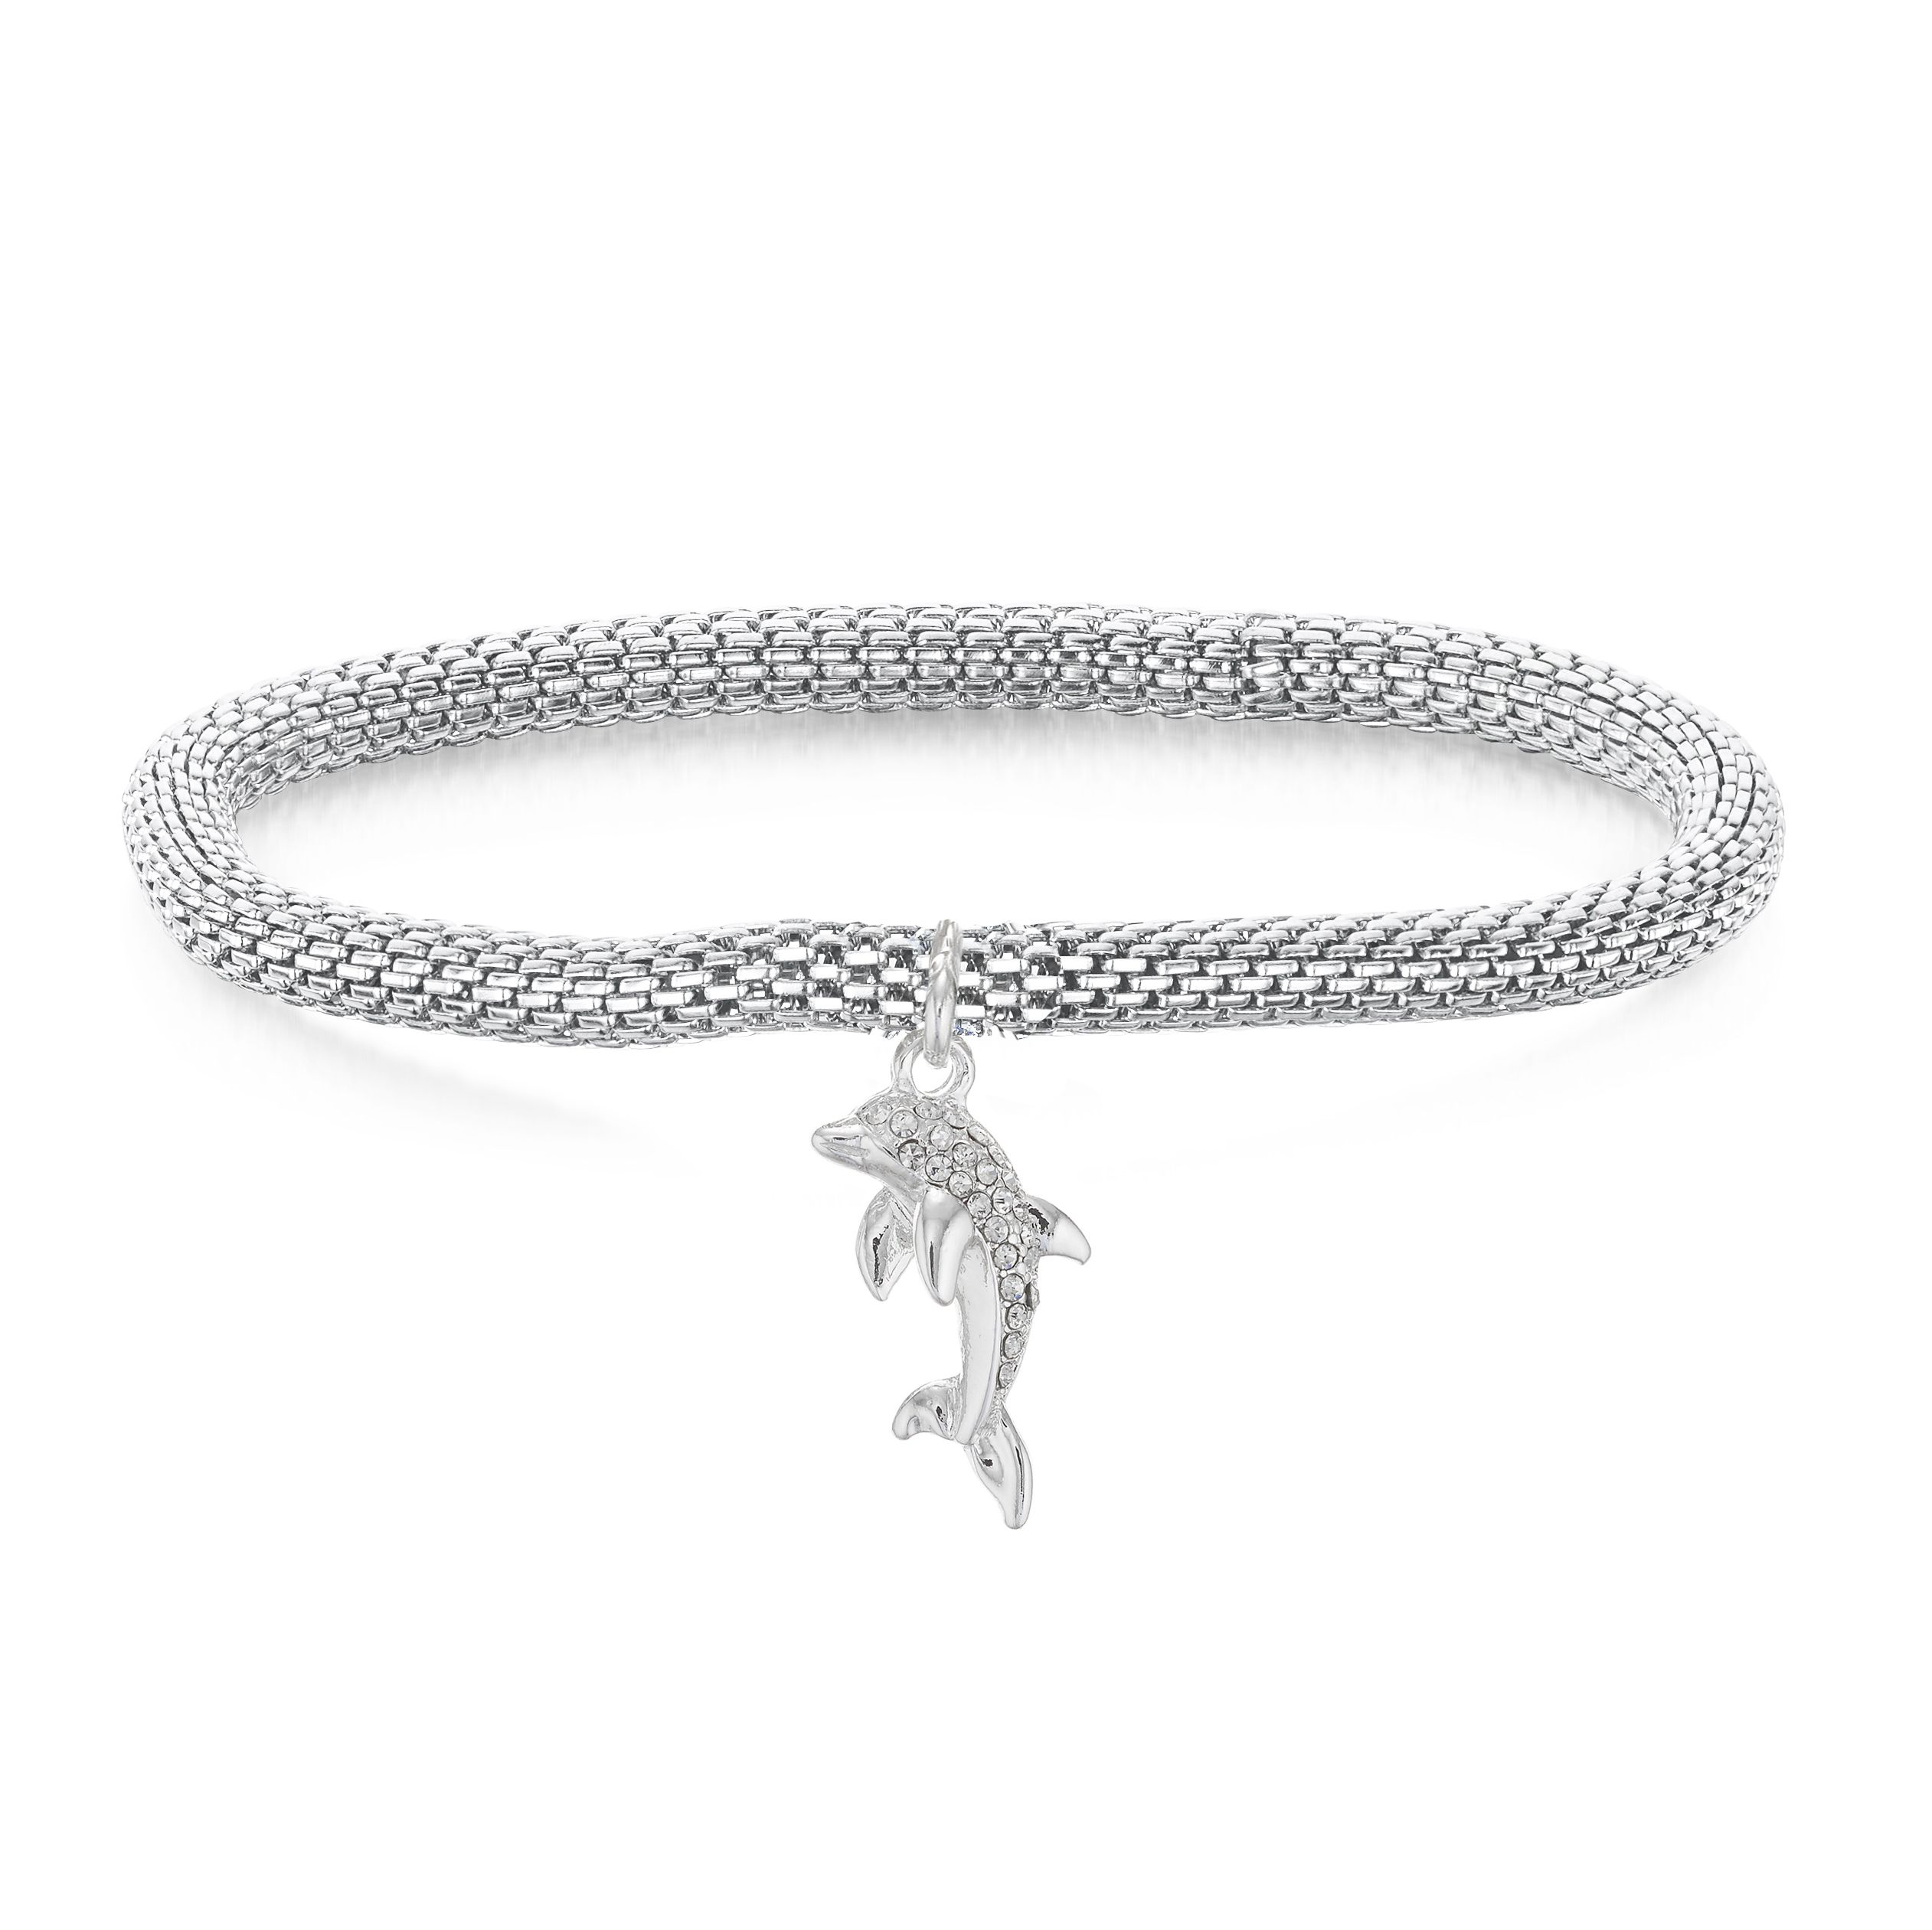 Buckley London Mesh Dolphin Charm Bracelet